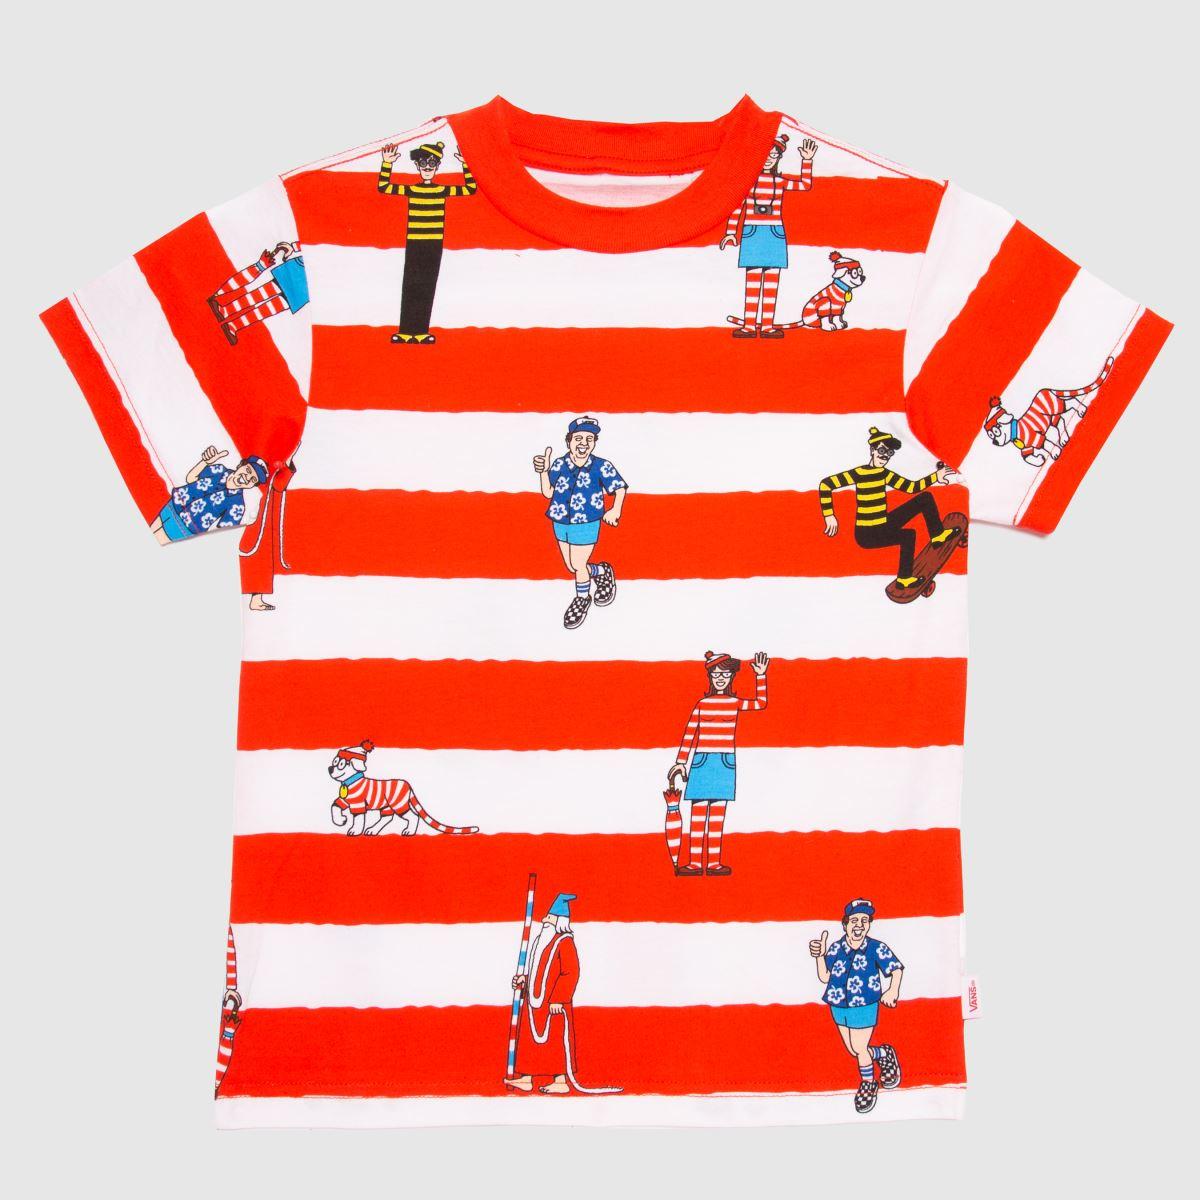 Vans White & Red Wheres Waldo T-shirt